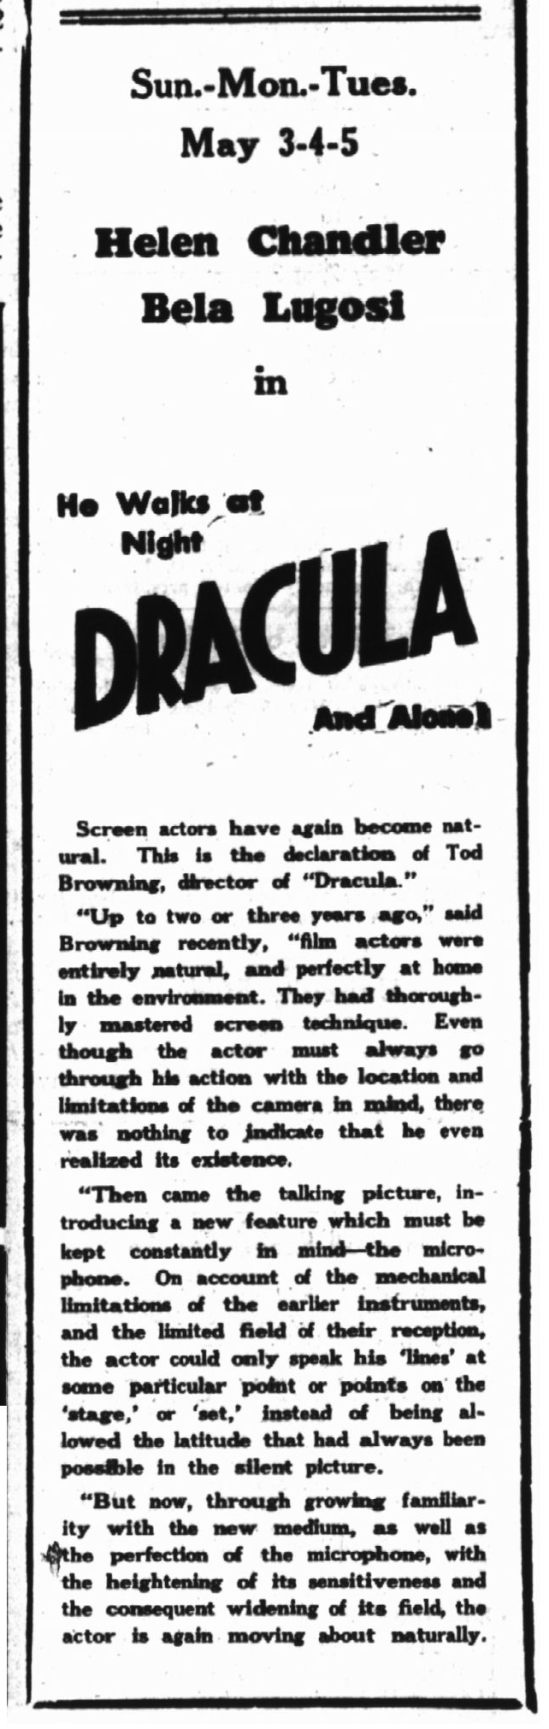 DRacula, Hyde Park Herald, May 1, 1931